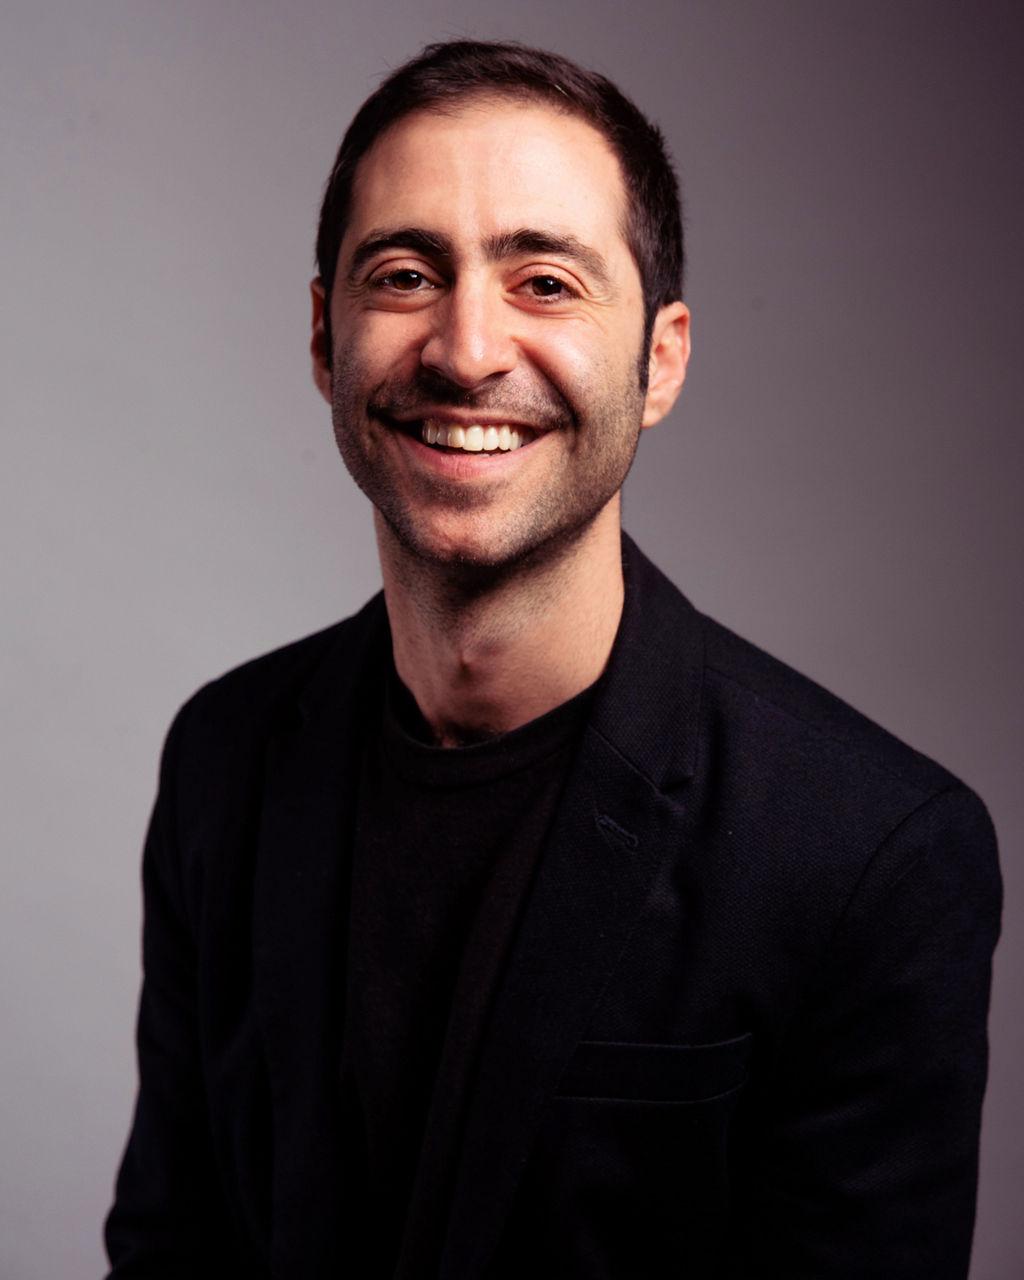 Amer Jandali Branding Portraits